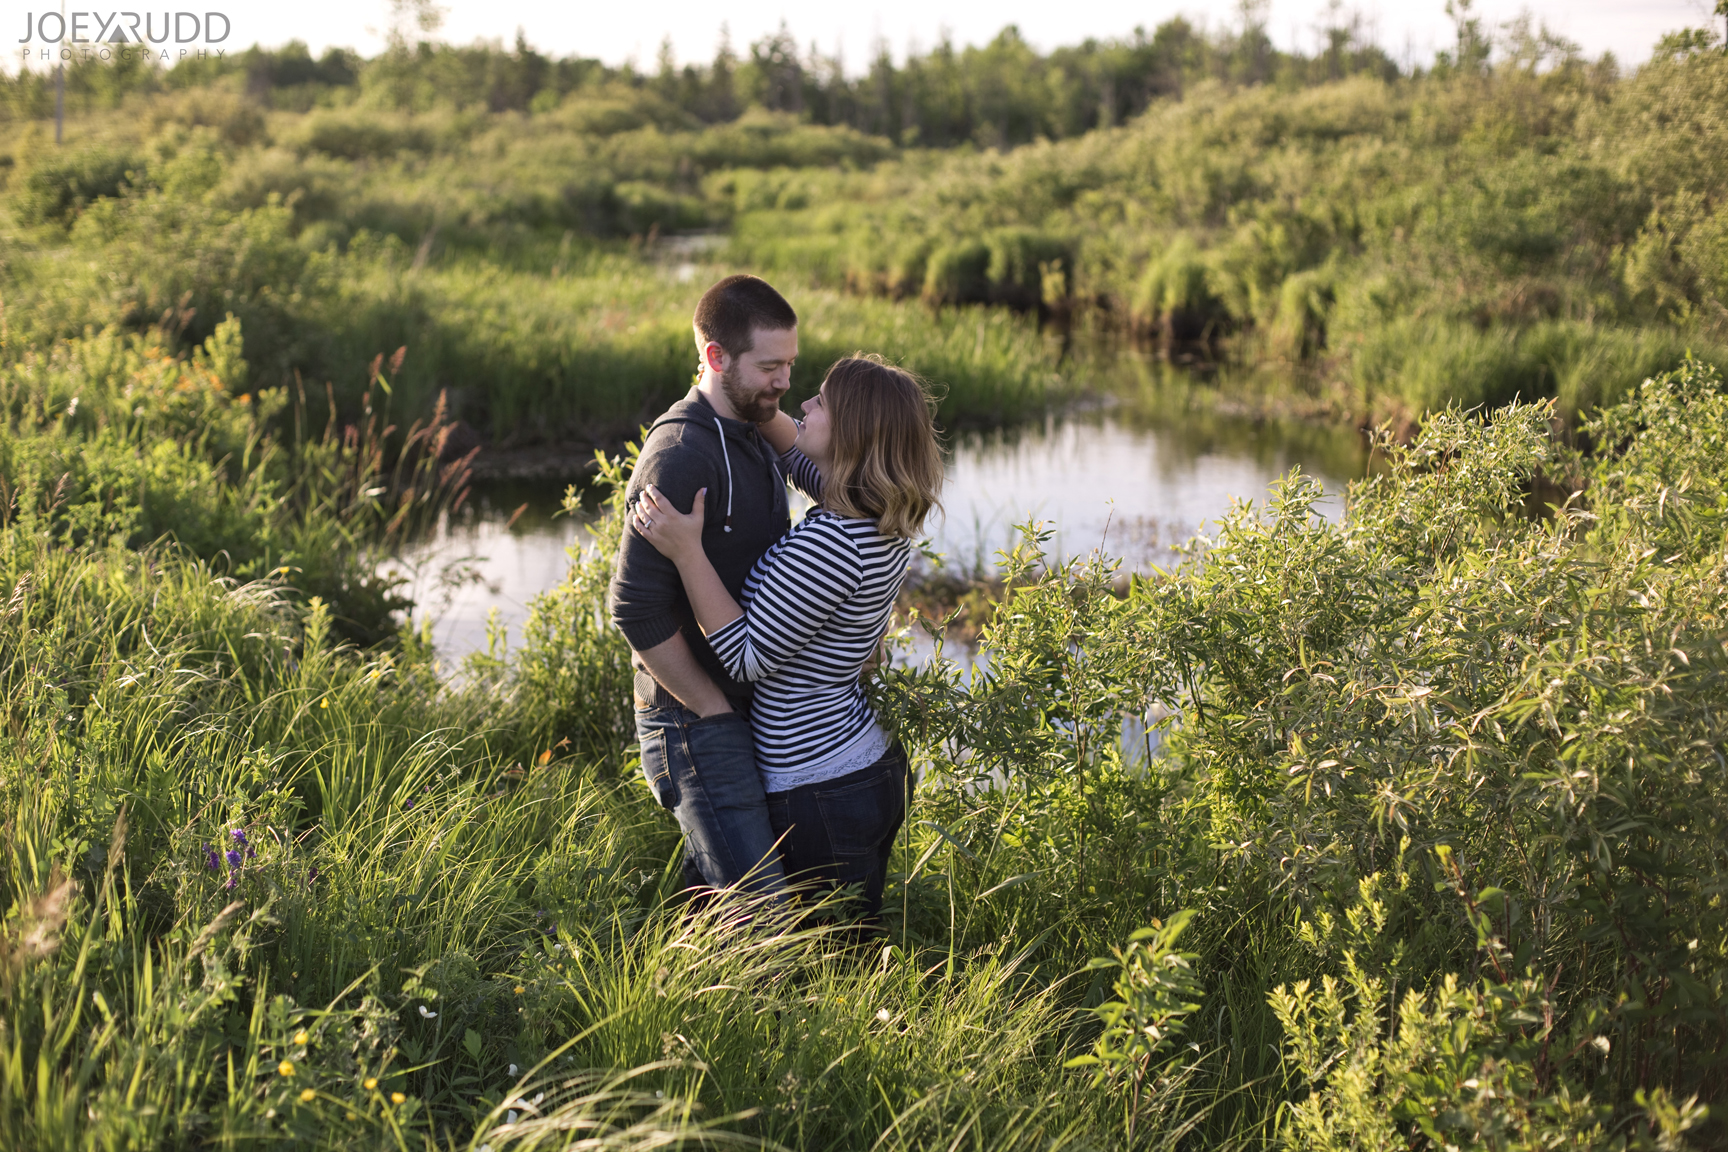 Rustic Engagement by Ottawa Wedding Photographer Joey Rudd Photography River